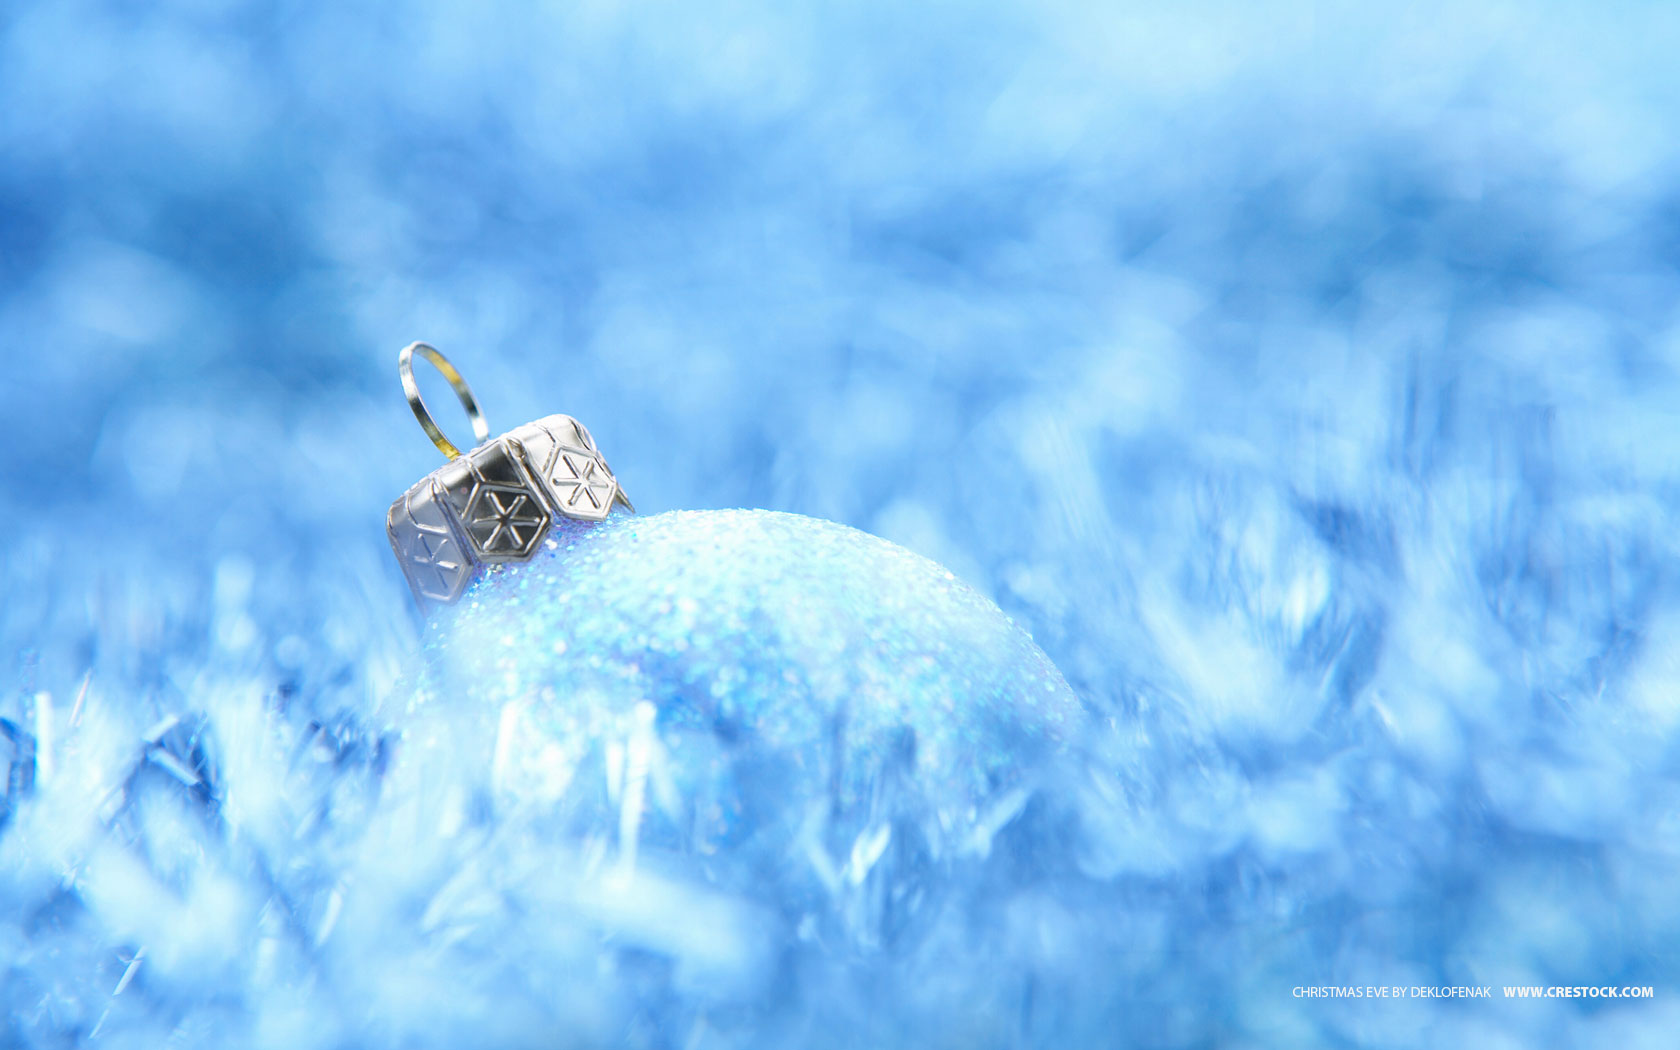 16 Stunning High Resolution Christmas Wallpapers | Crestock.com Blog